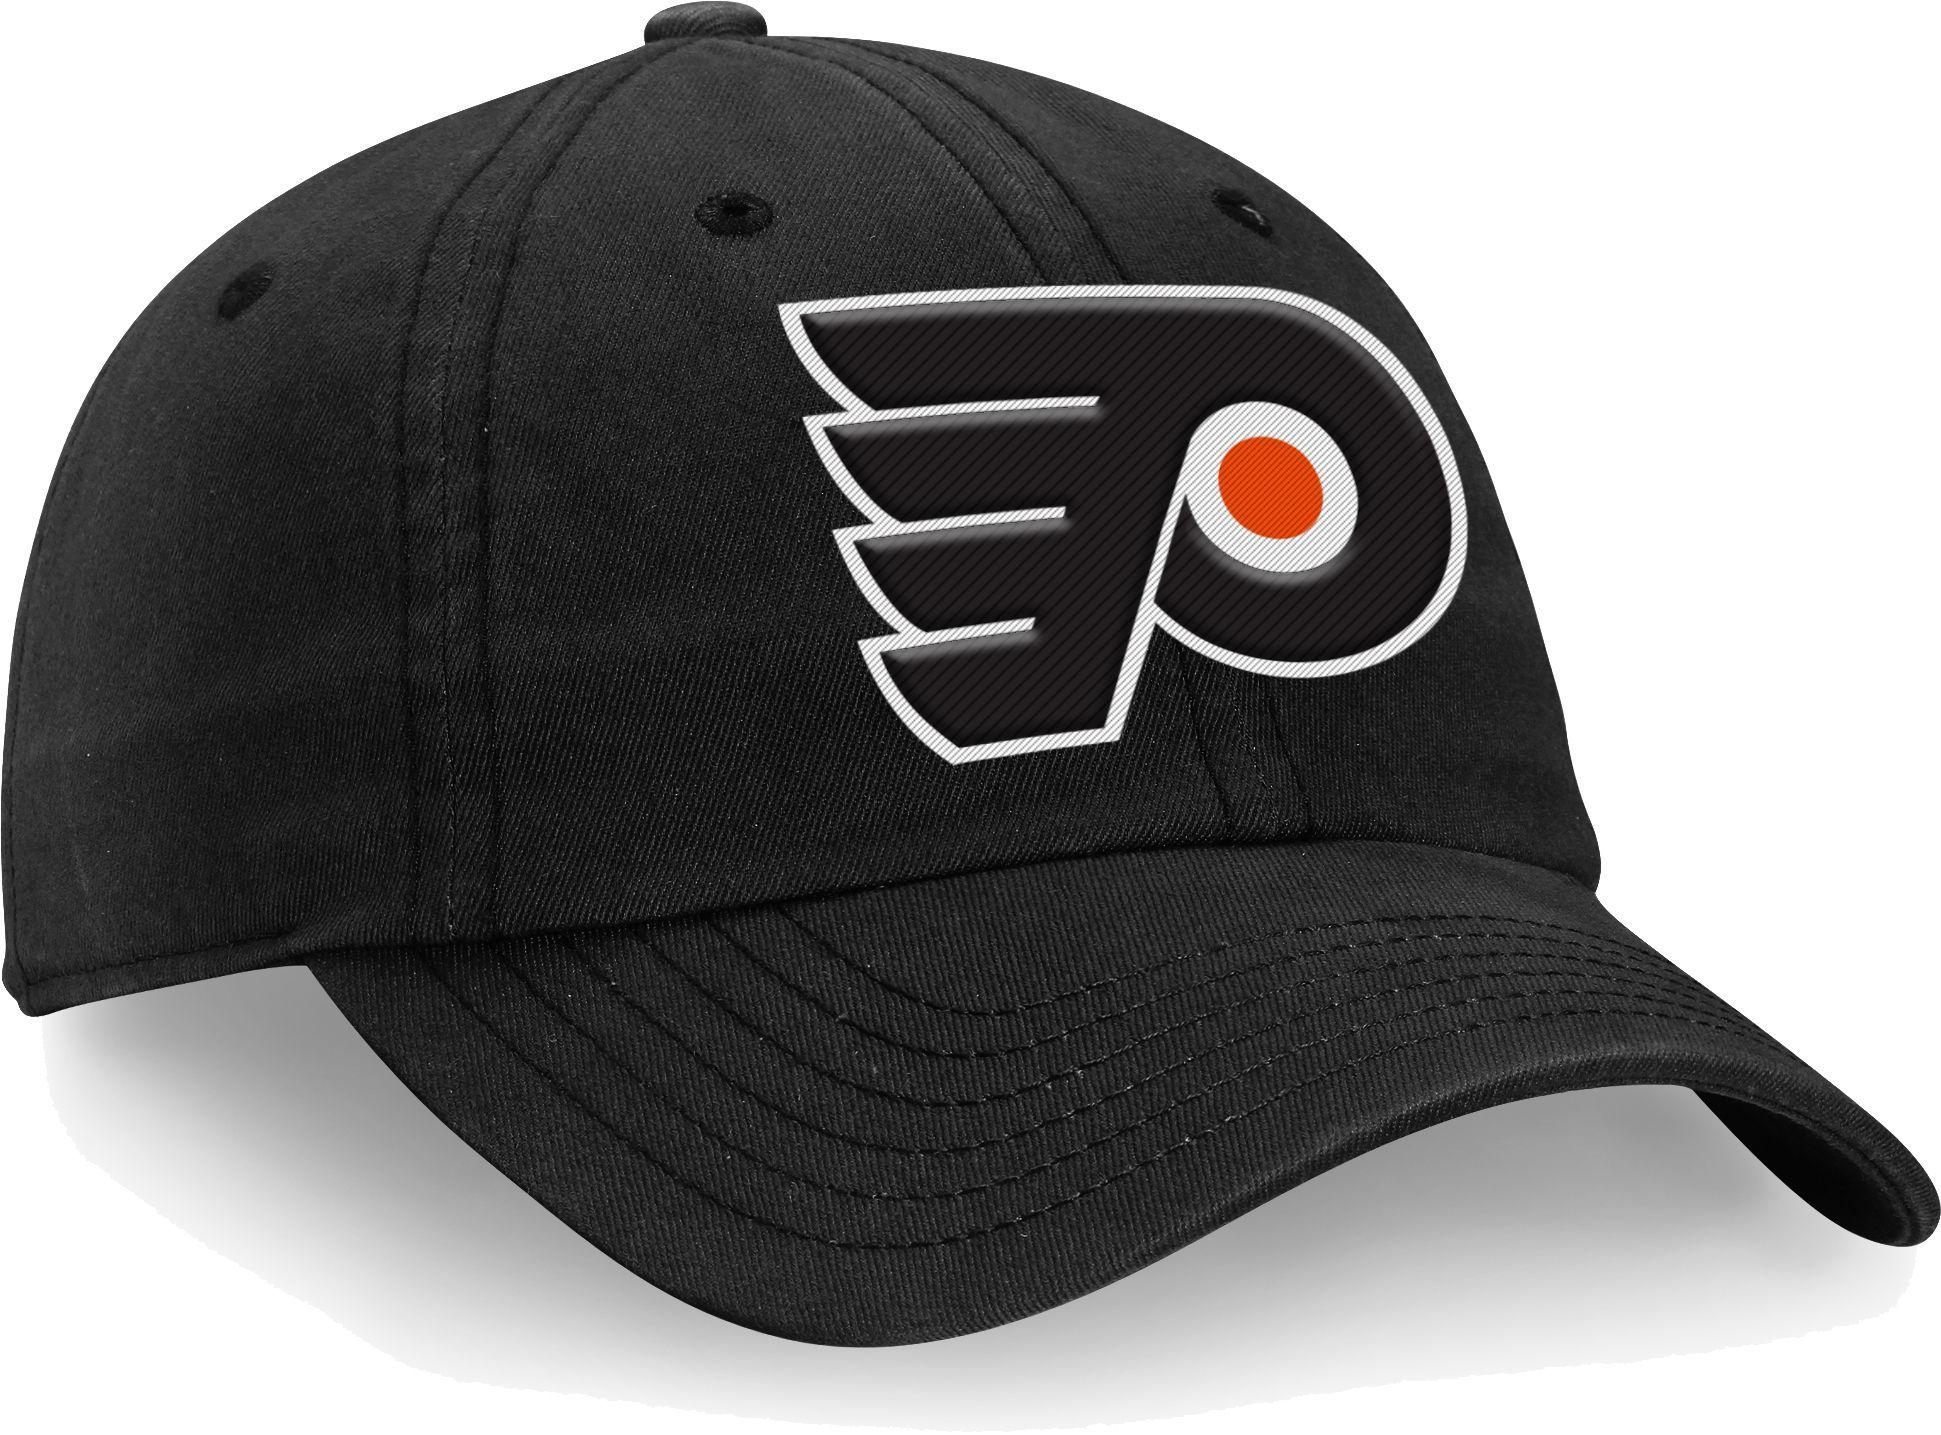 2b980bb6 NHL Men's Philadelphia Flyers Alternate Jersey Black Adjustable Hat ...